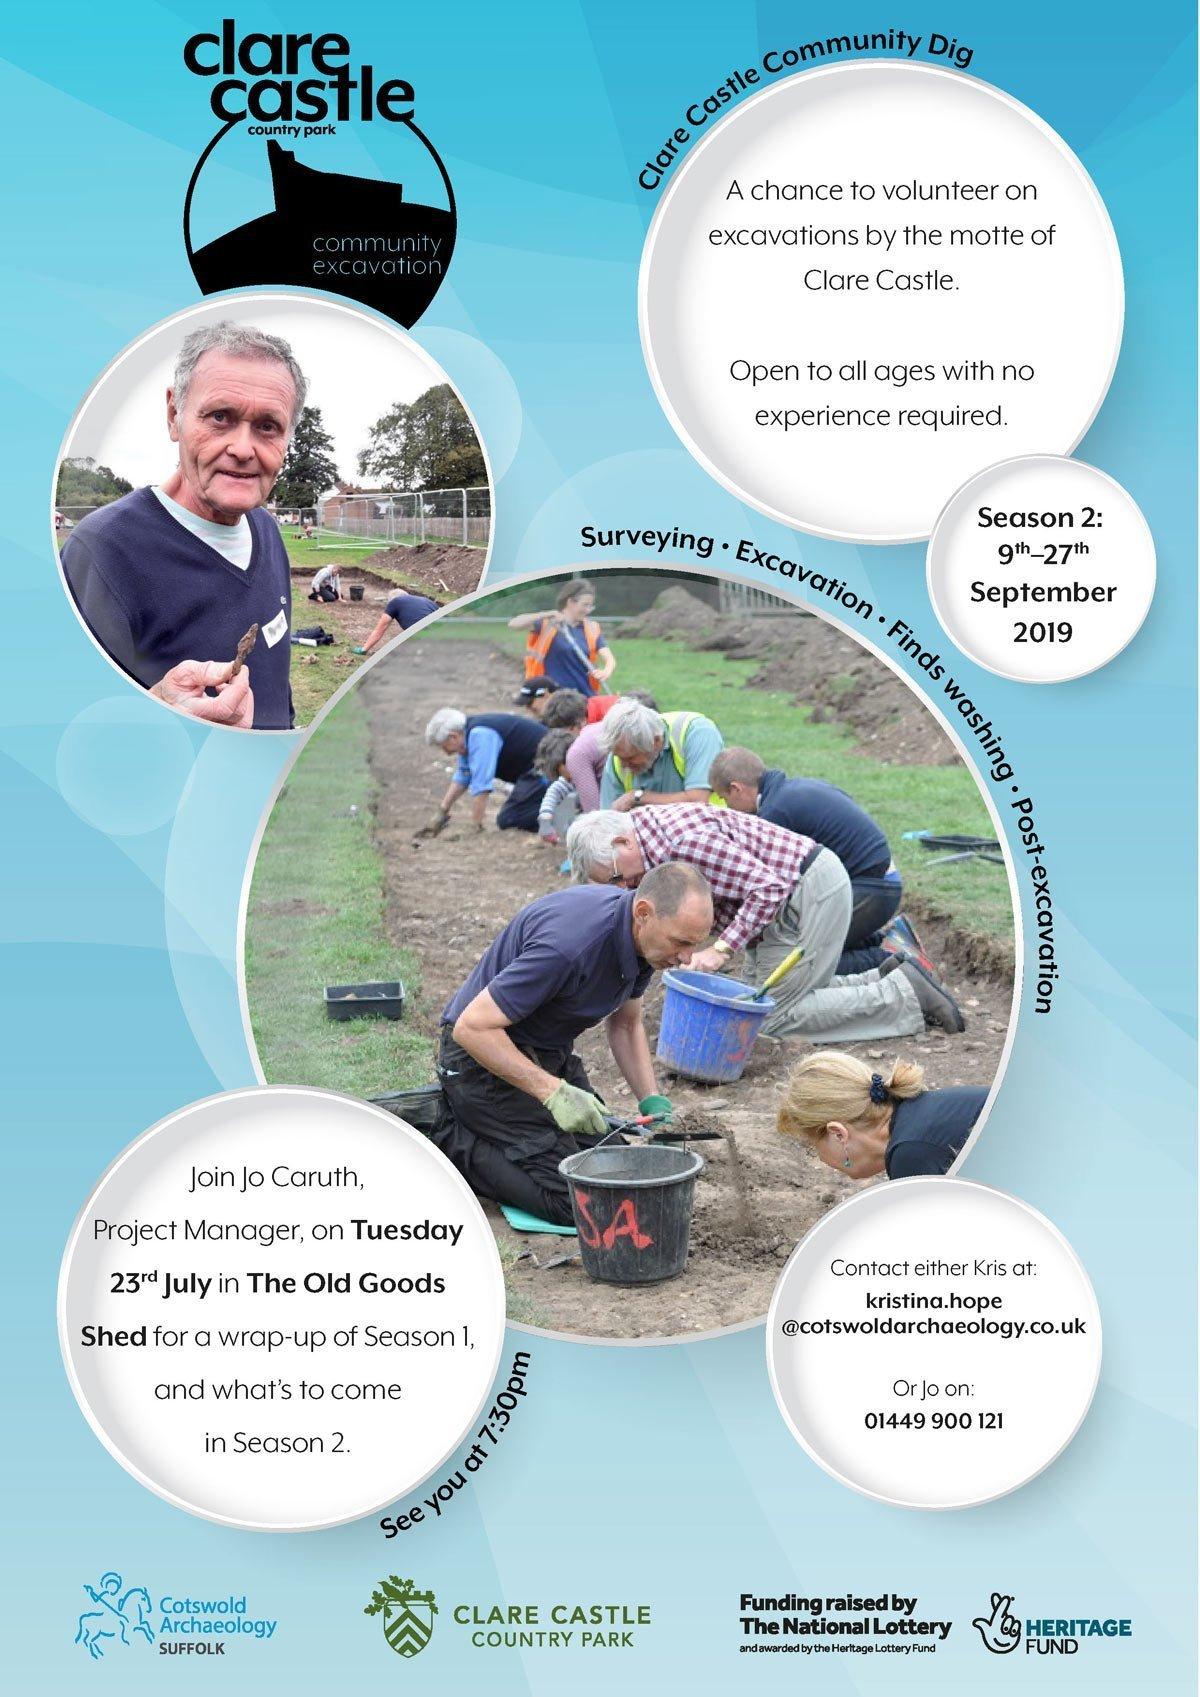 Clare Castle Community excavation poster